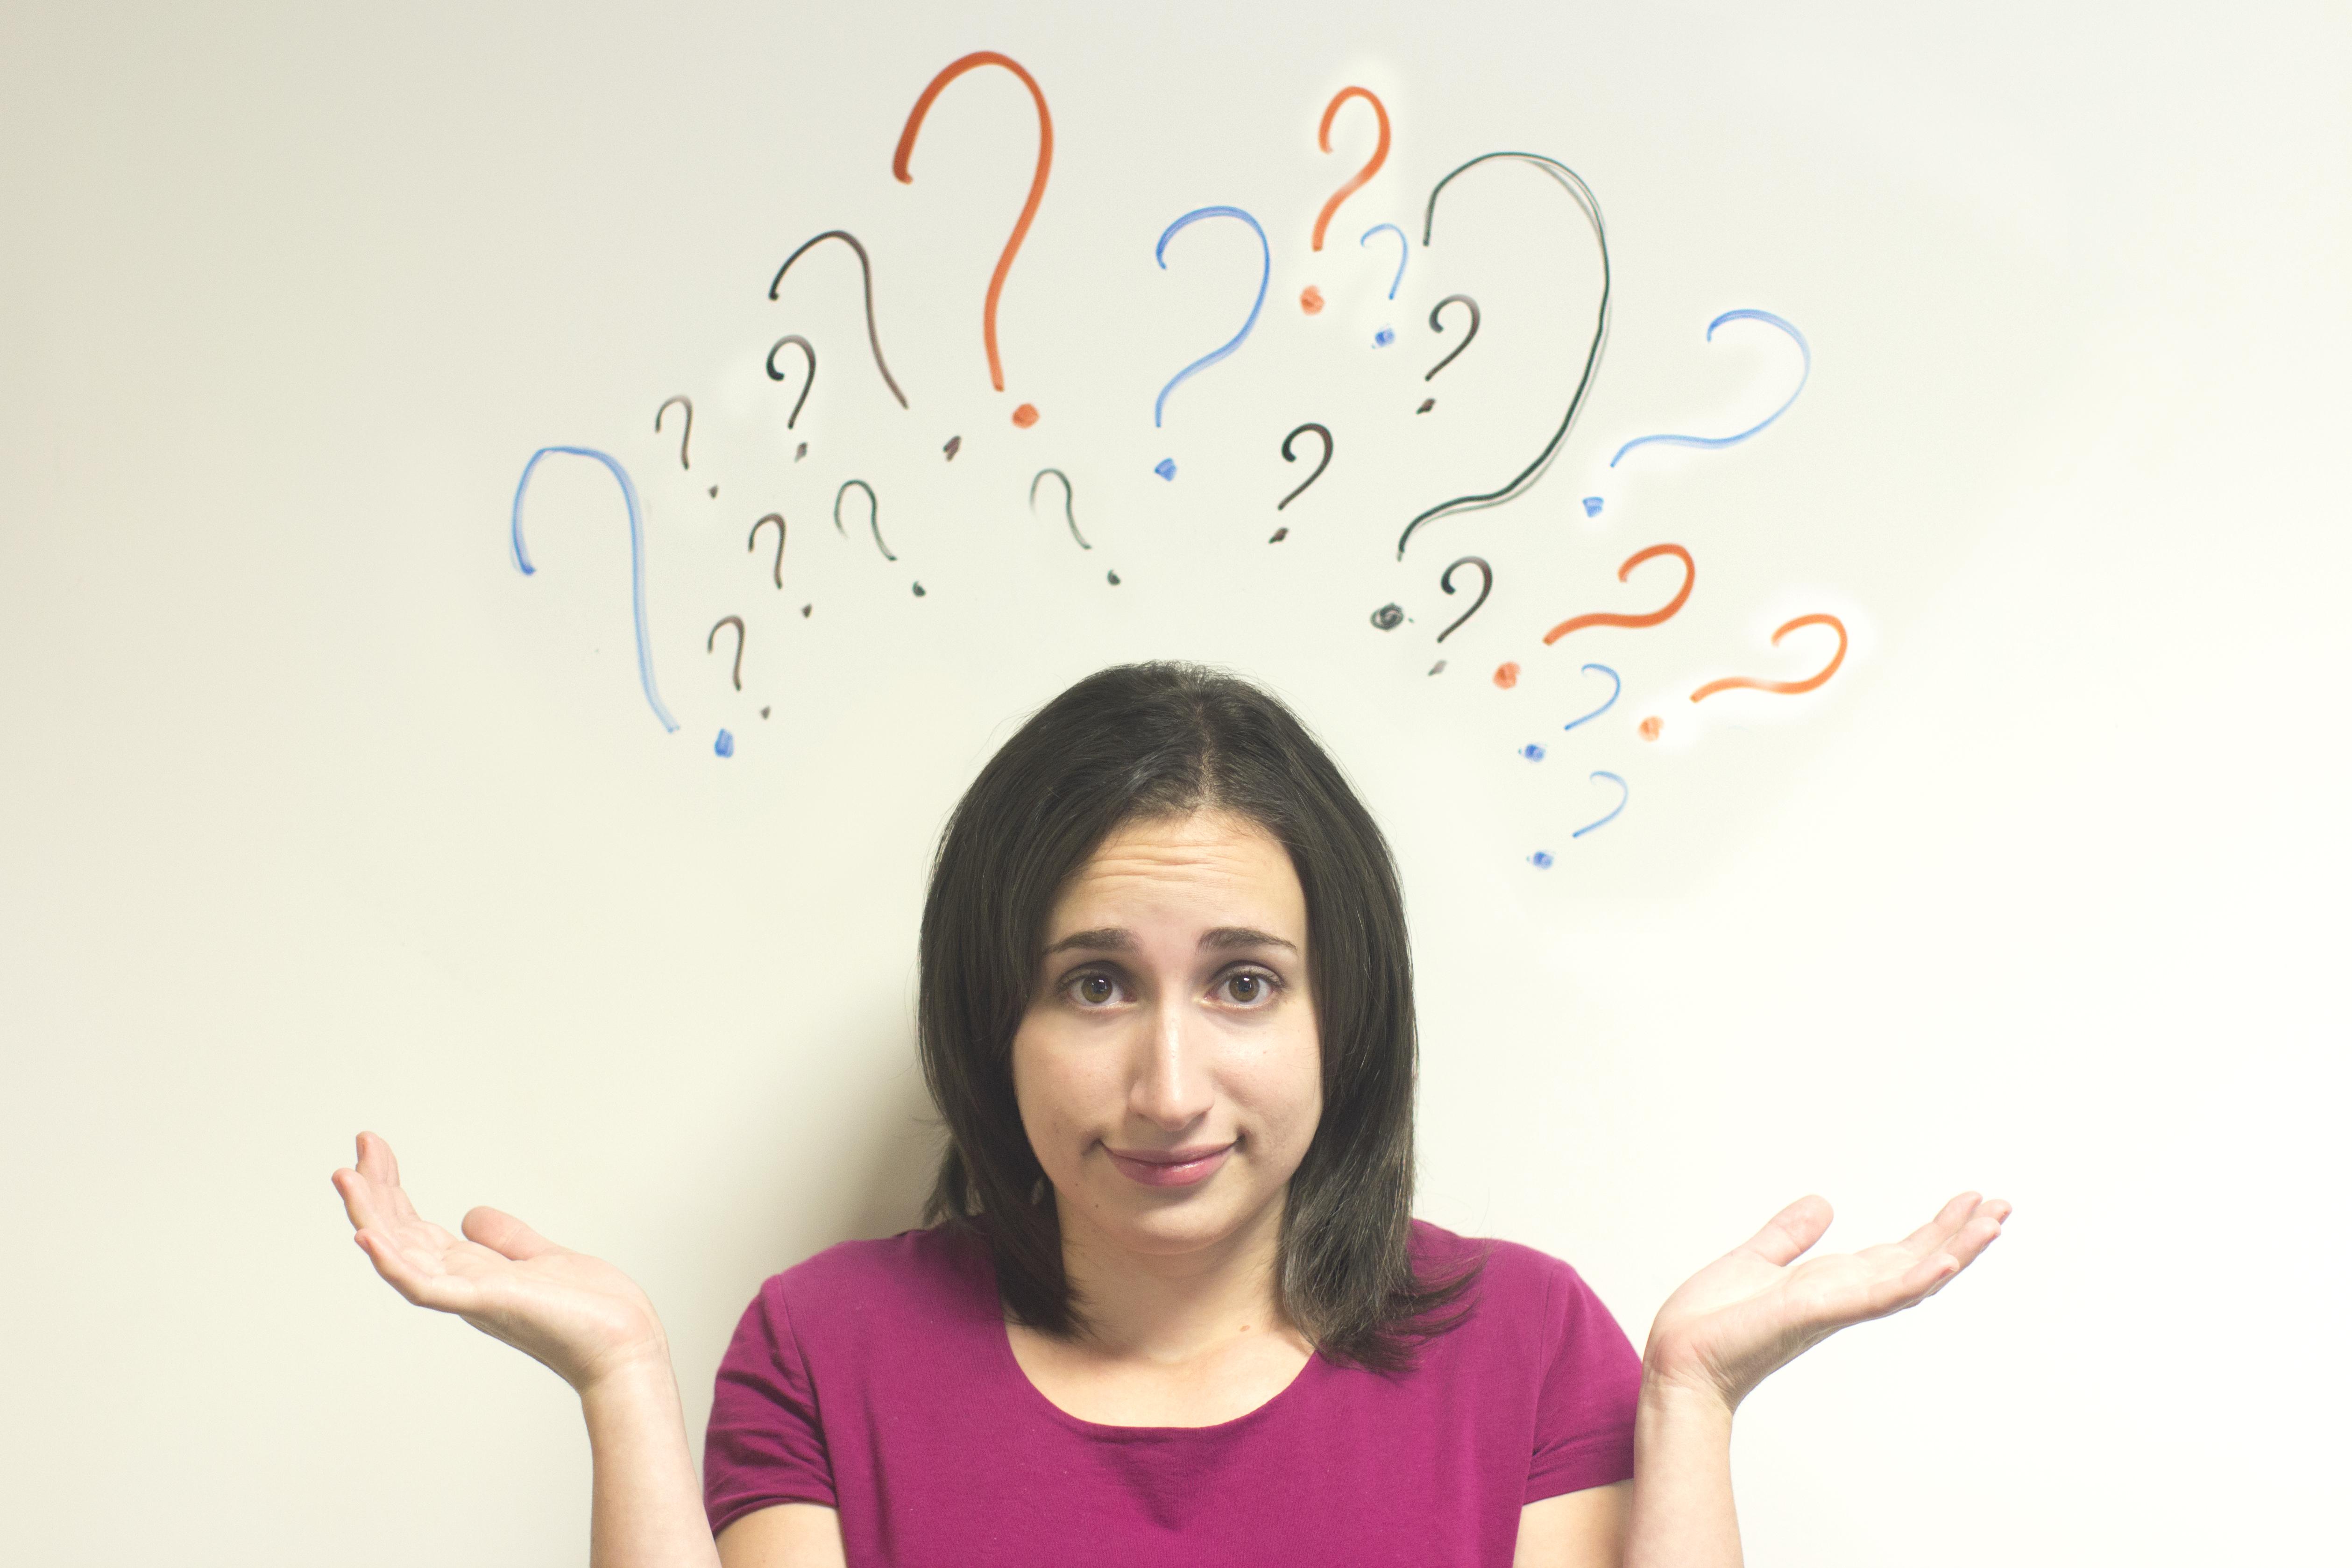 hiring via social media and answering career questions podcast hiring via social media and answering career questions podcast